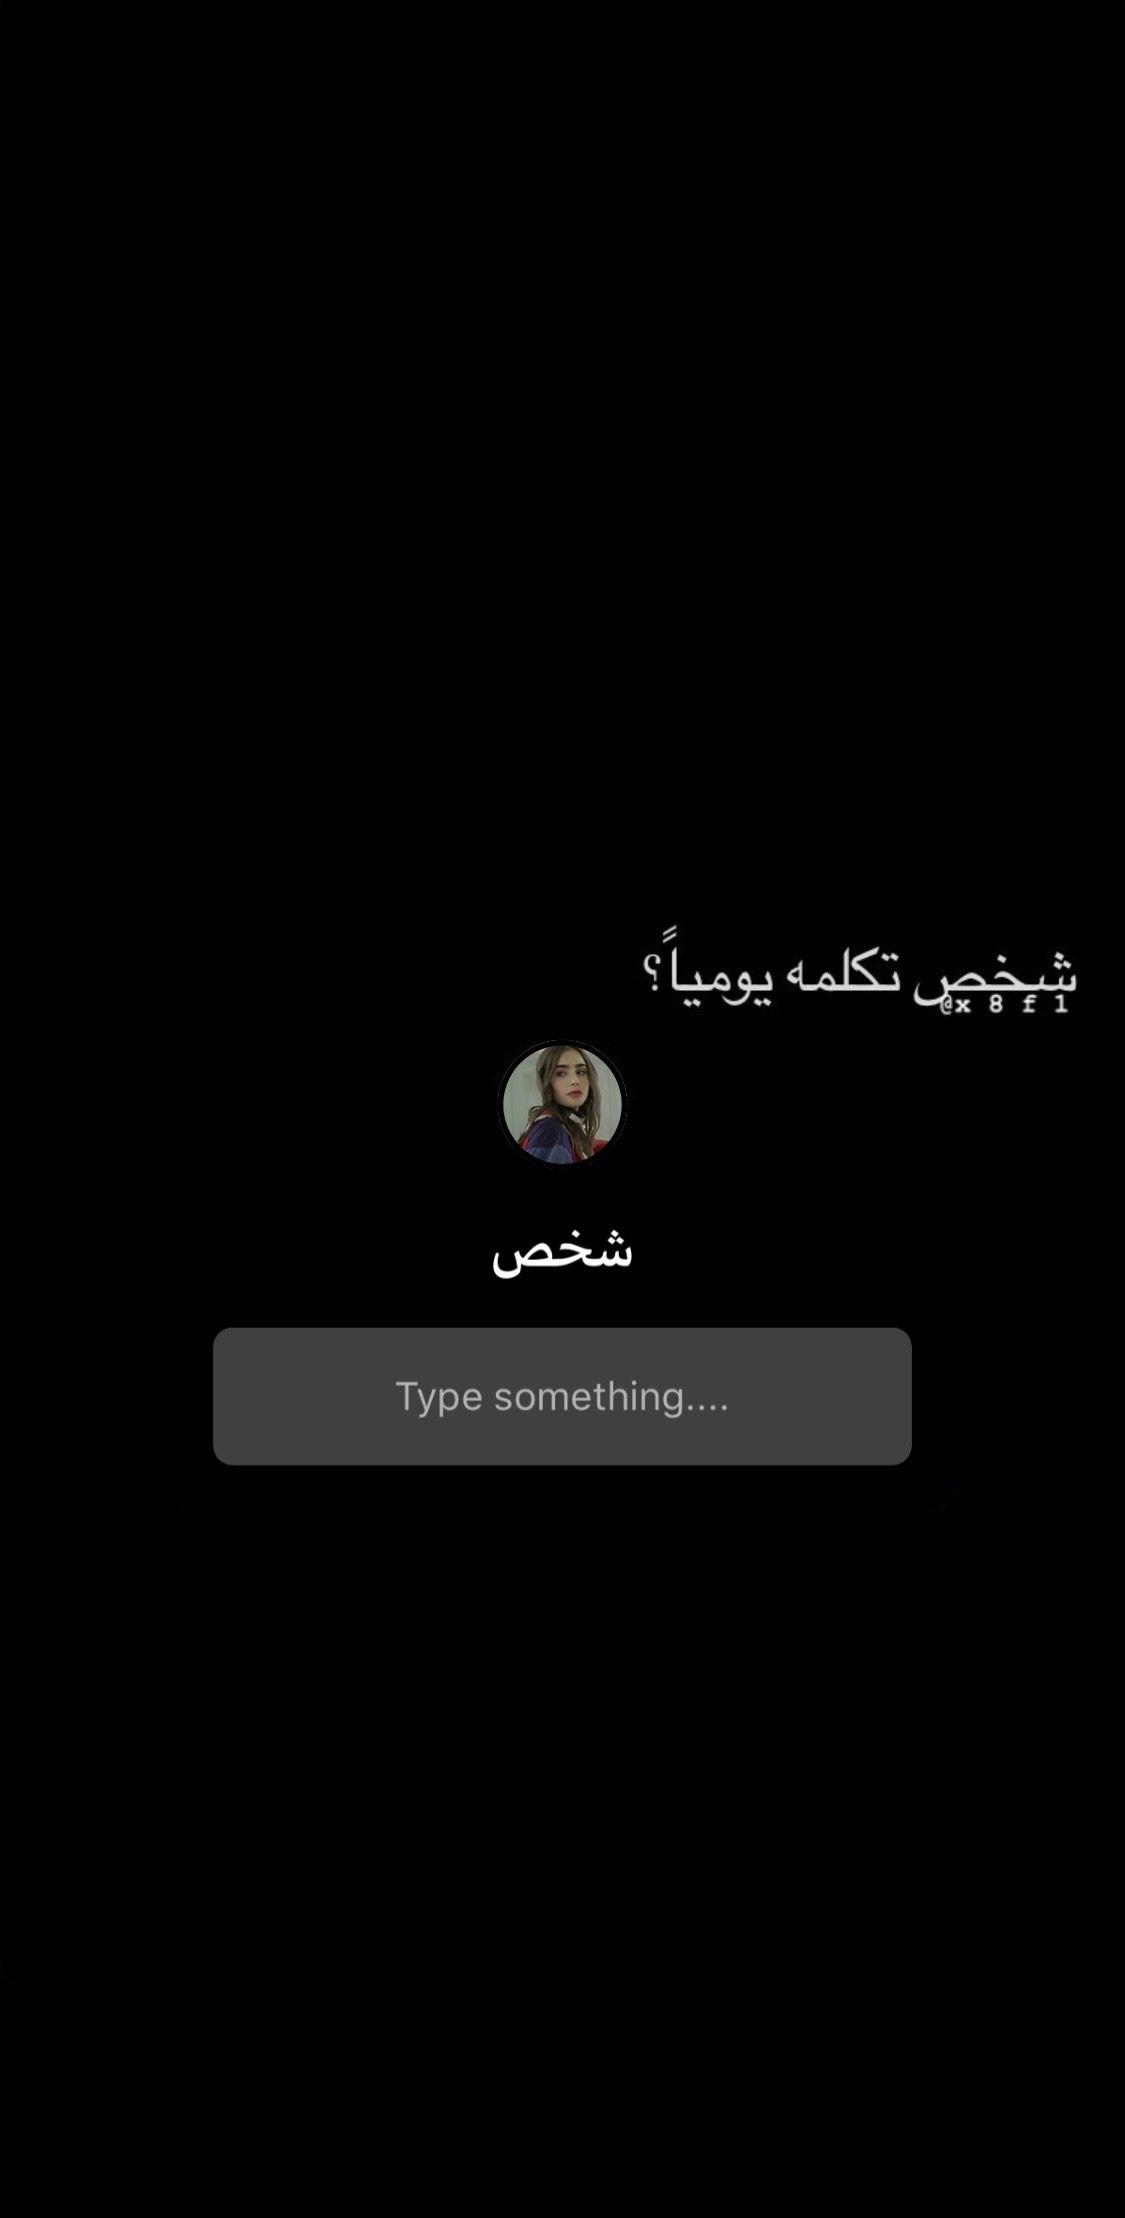 صديقه عمري Beautiful Arabic Words Funny Arabic Quotes Instagram Story Questions